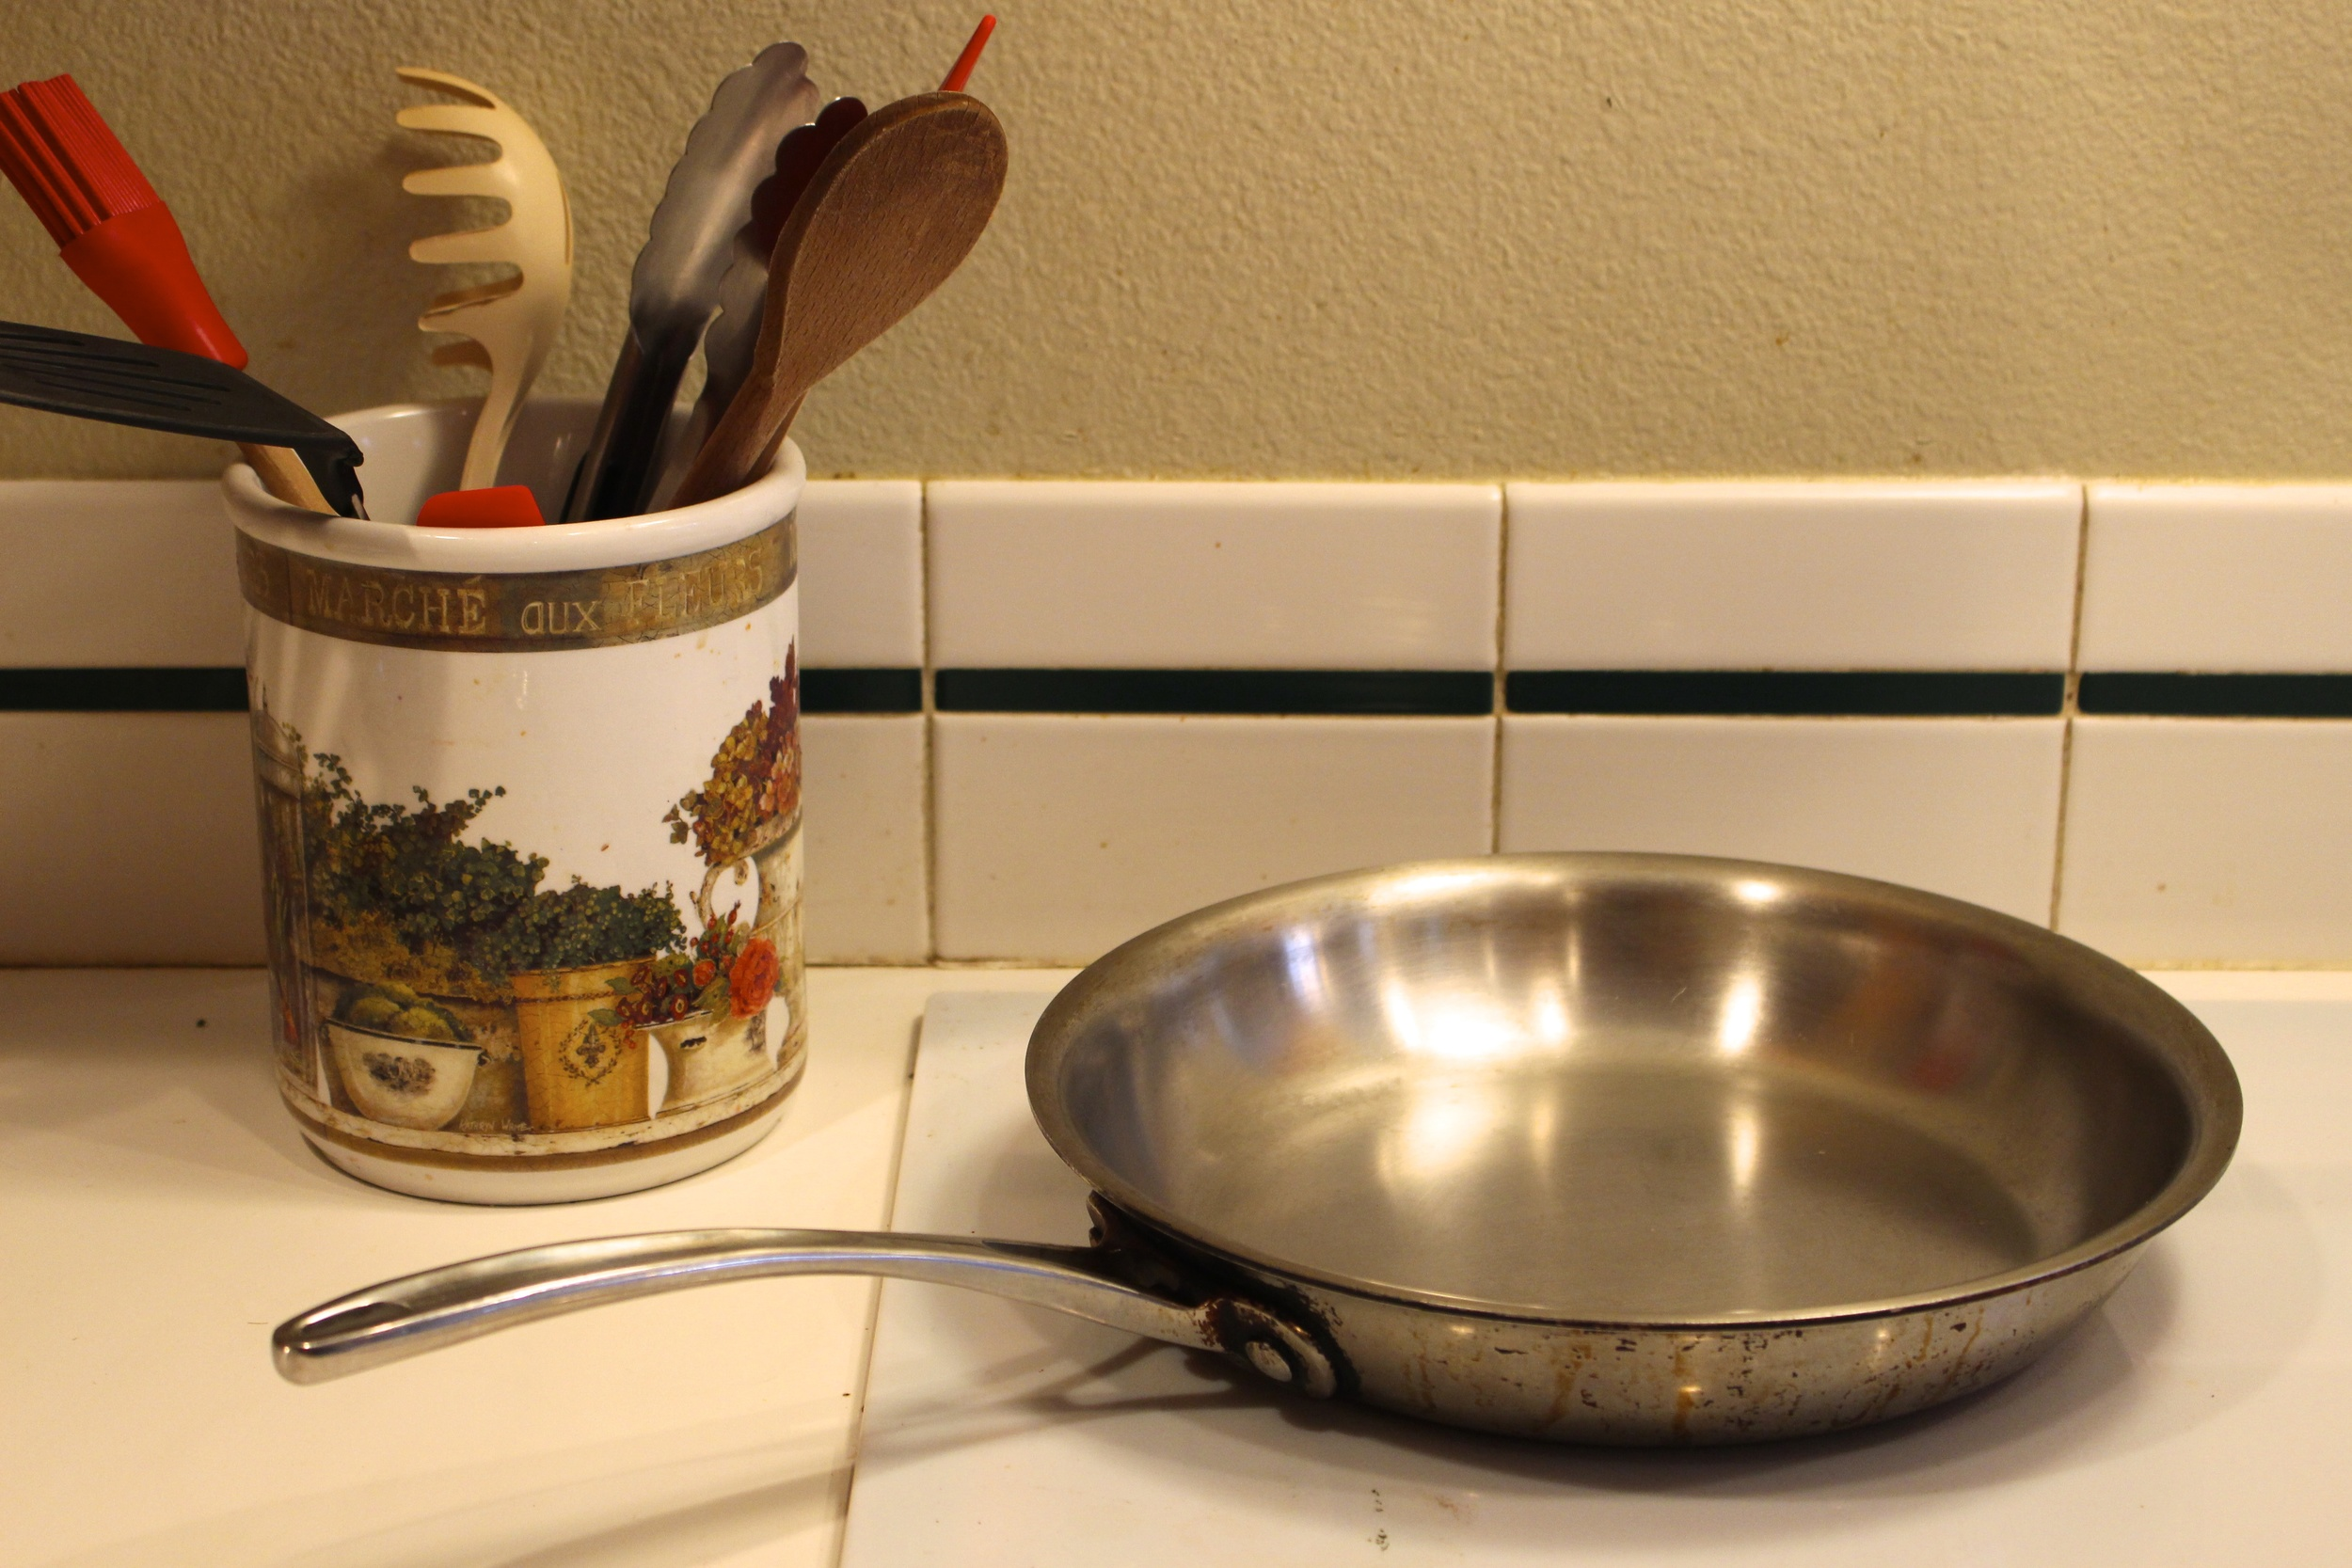 frying pan prep.JPG